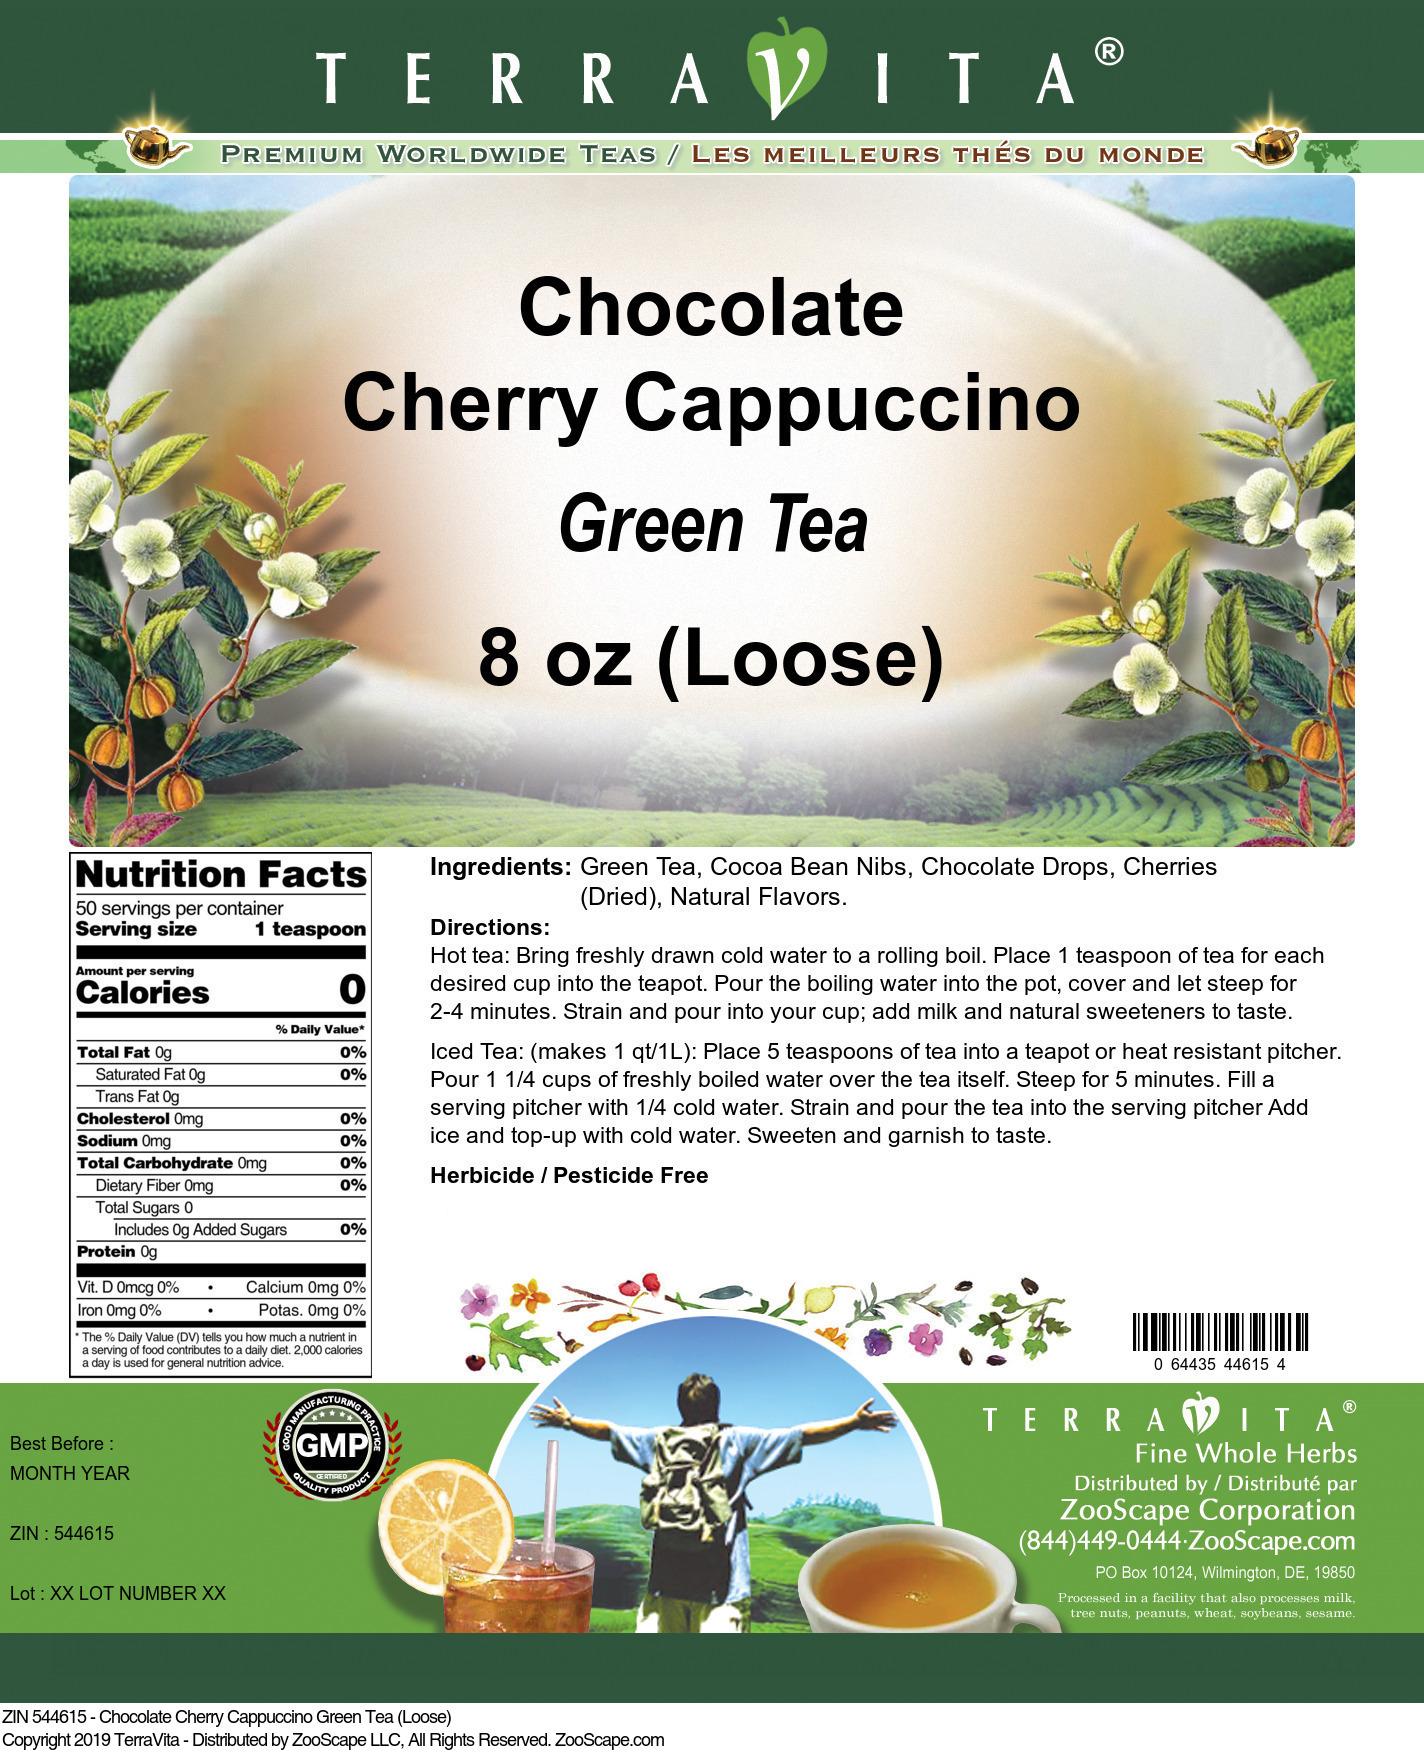 Chocolate Cherry Cappuccino Green Tea